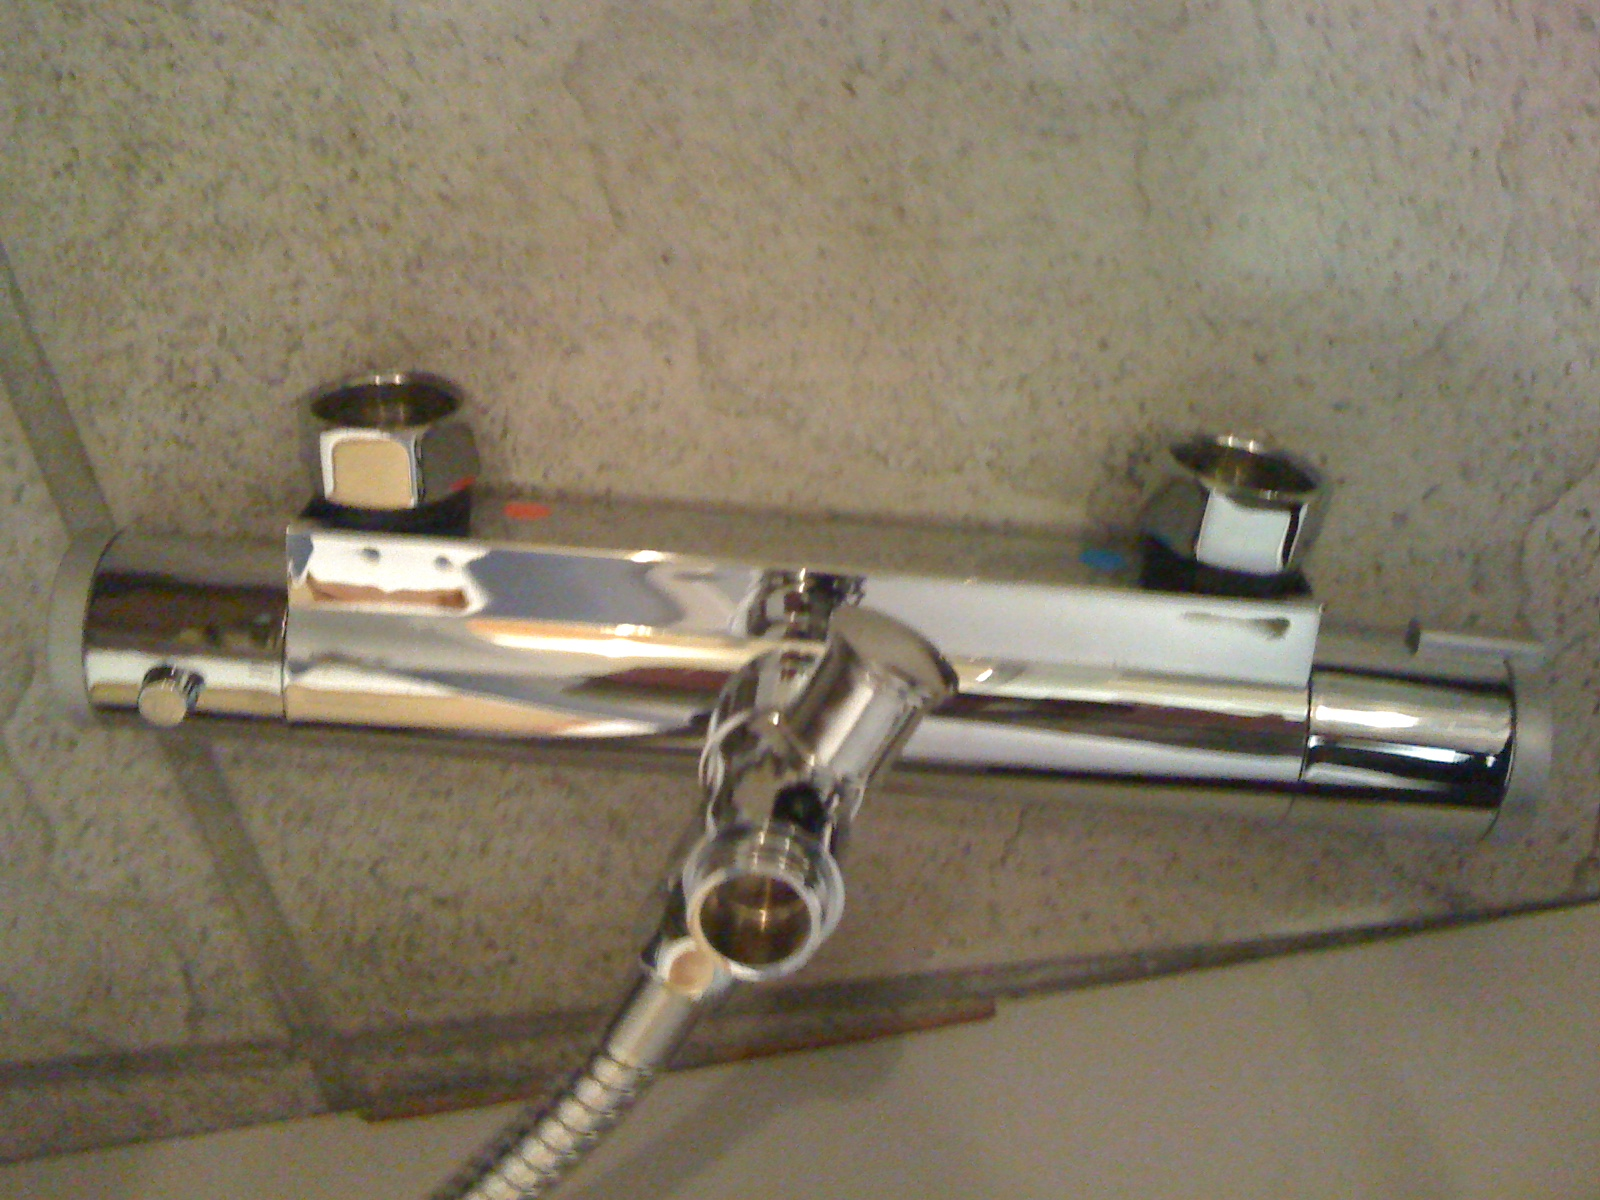 raccord mitigeur aux tuyaux - Douche Avec Tuyau Apparent